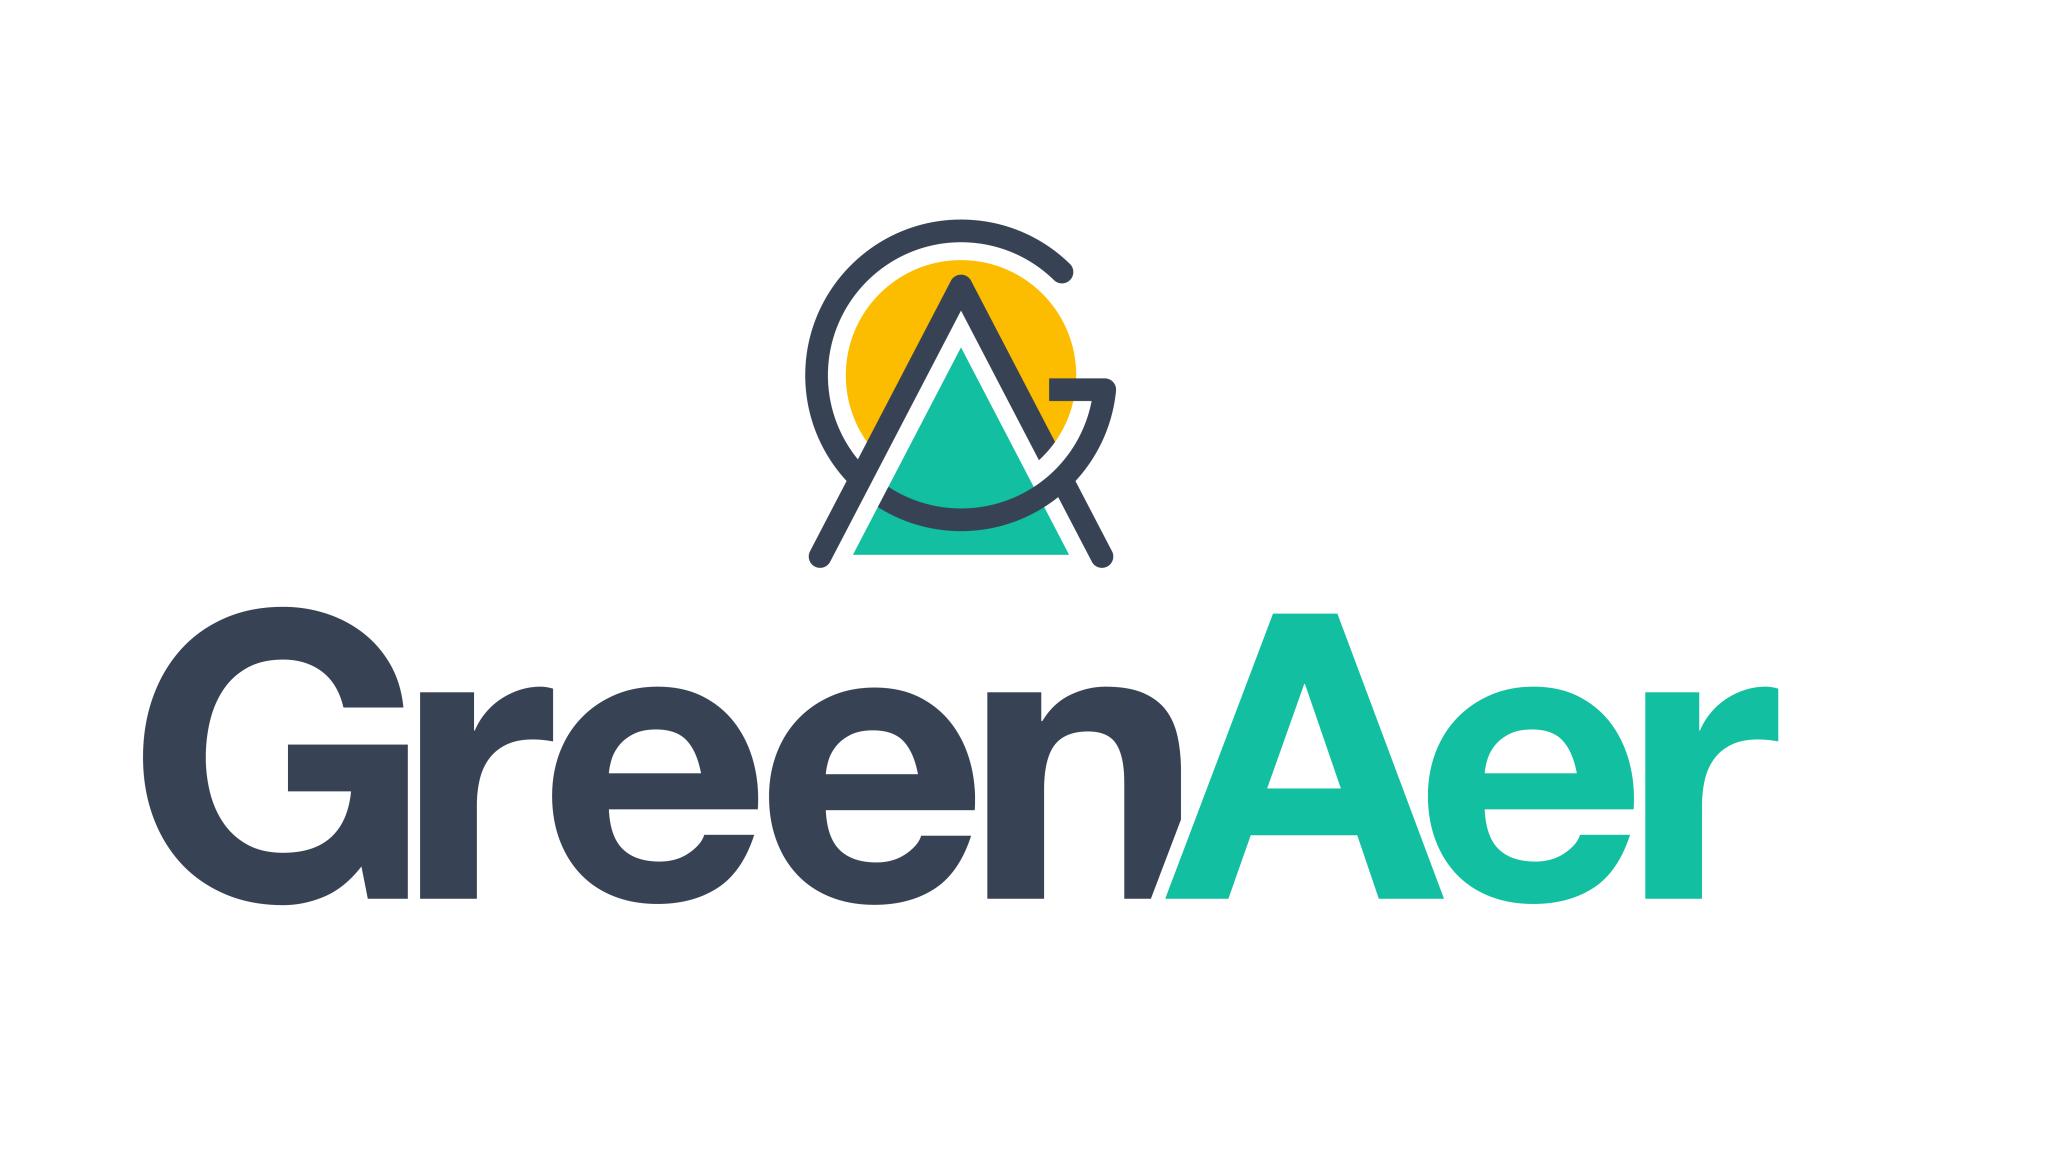 Greenaer 2018 Logo